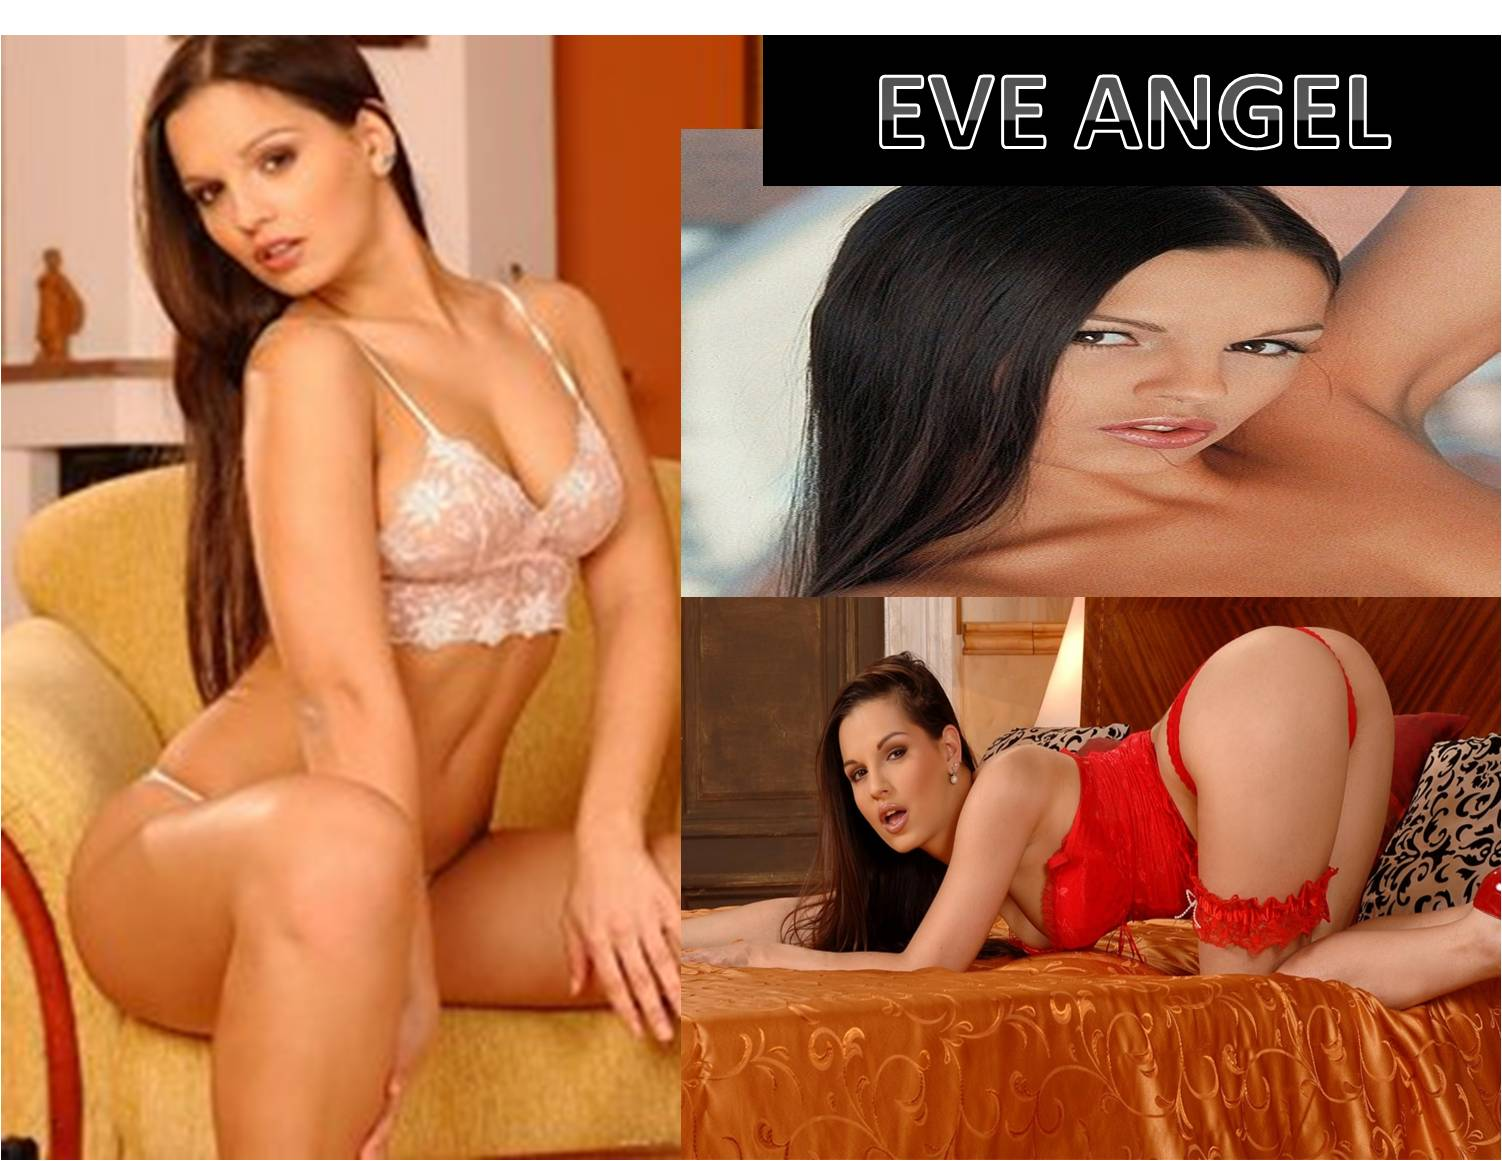 http://1.bp.blogspot.com/_THslowqRyvE/TS40uaH7ryI/AAAAAAAAAMk/f1HhzD2rtqk/s1600/eve+angel+1.jpg